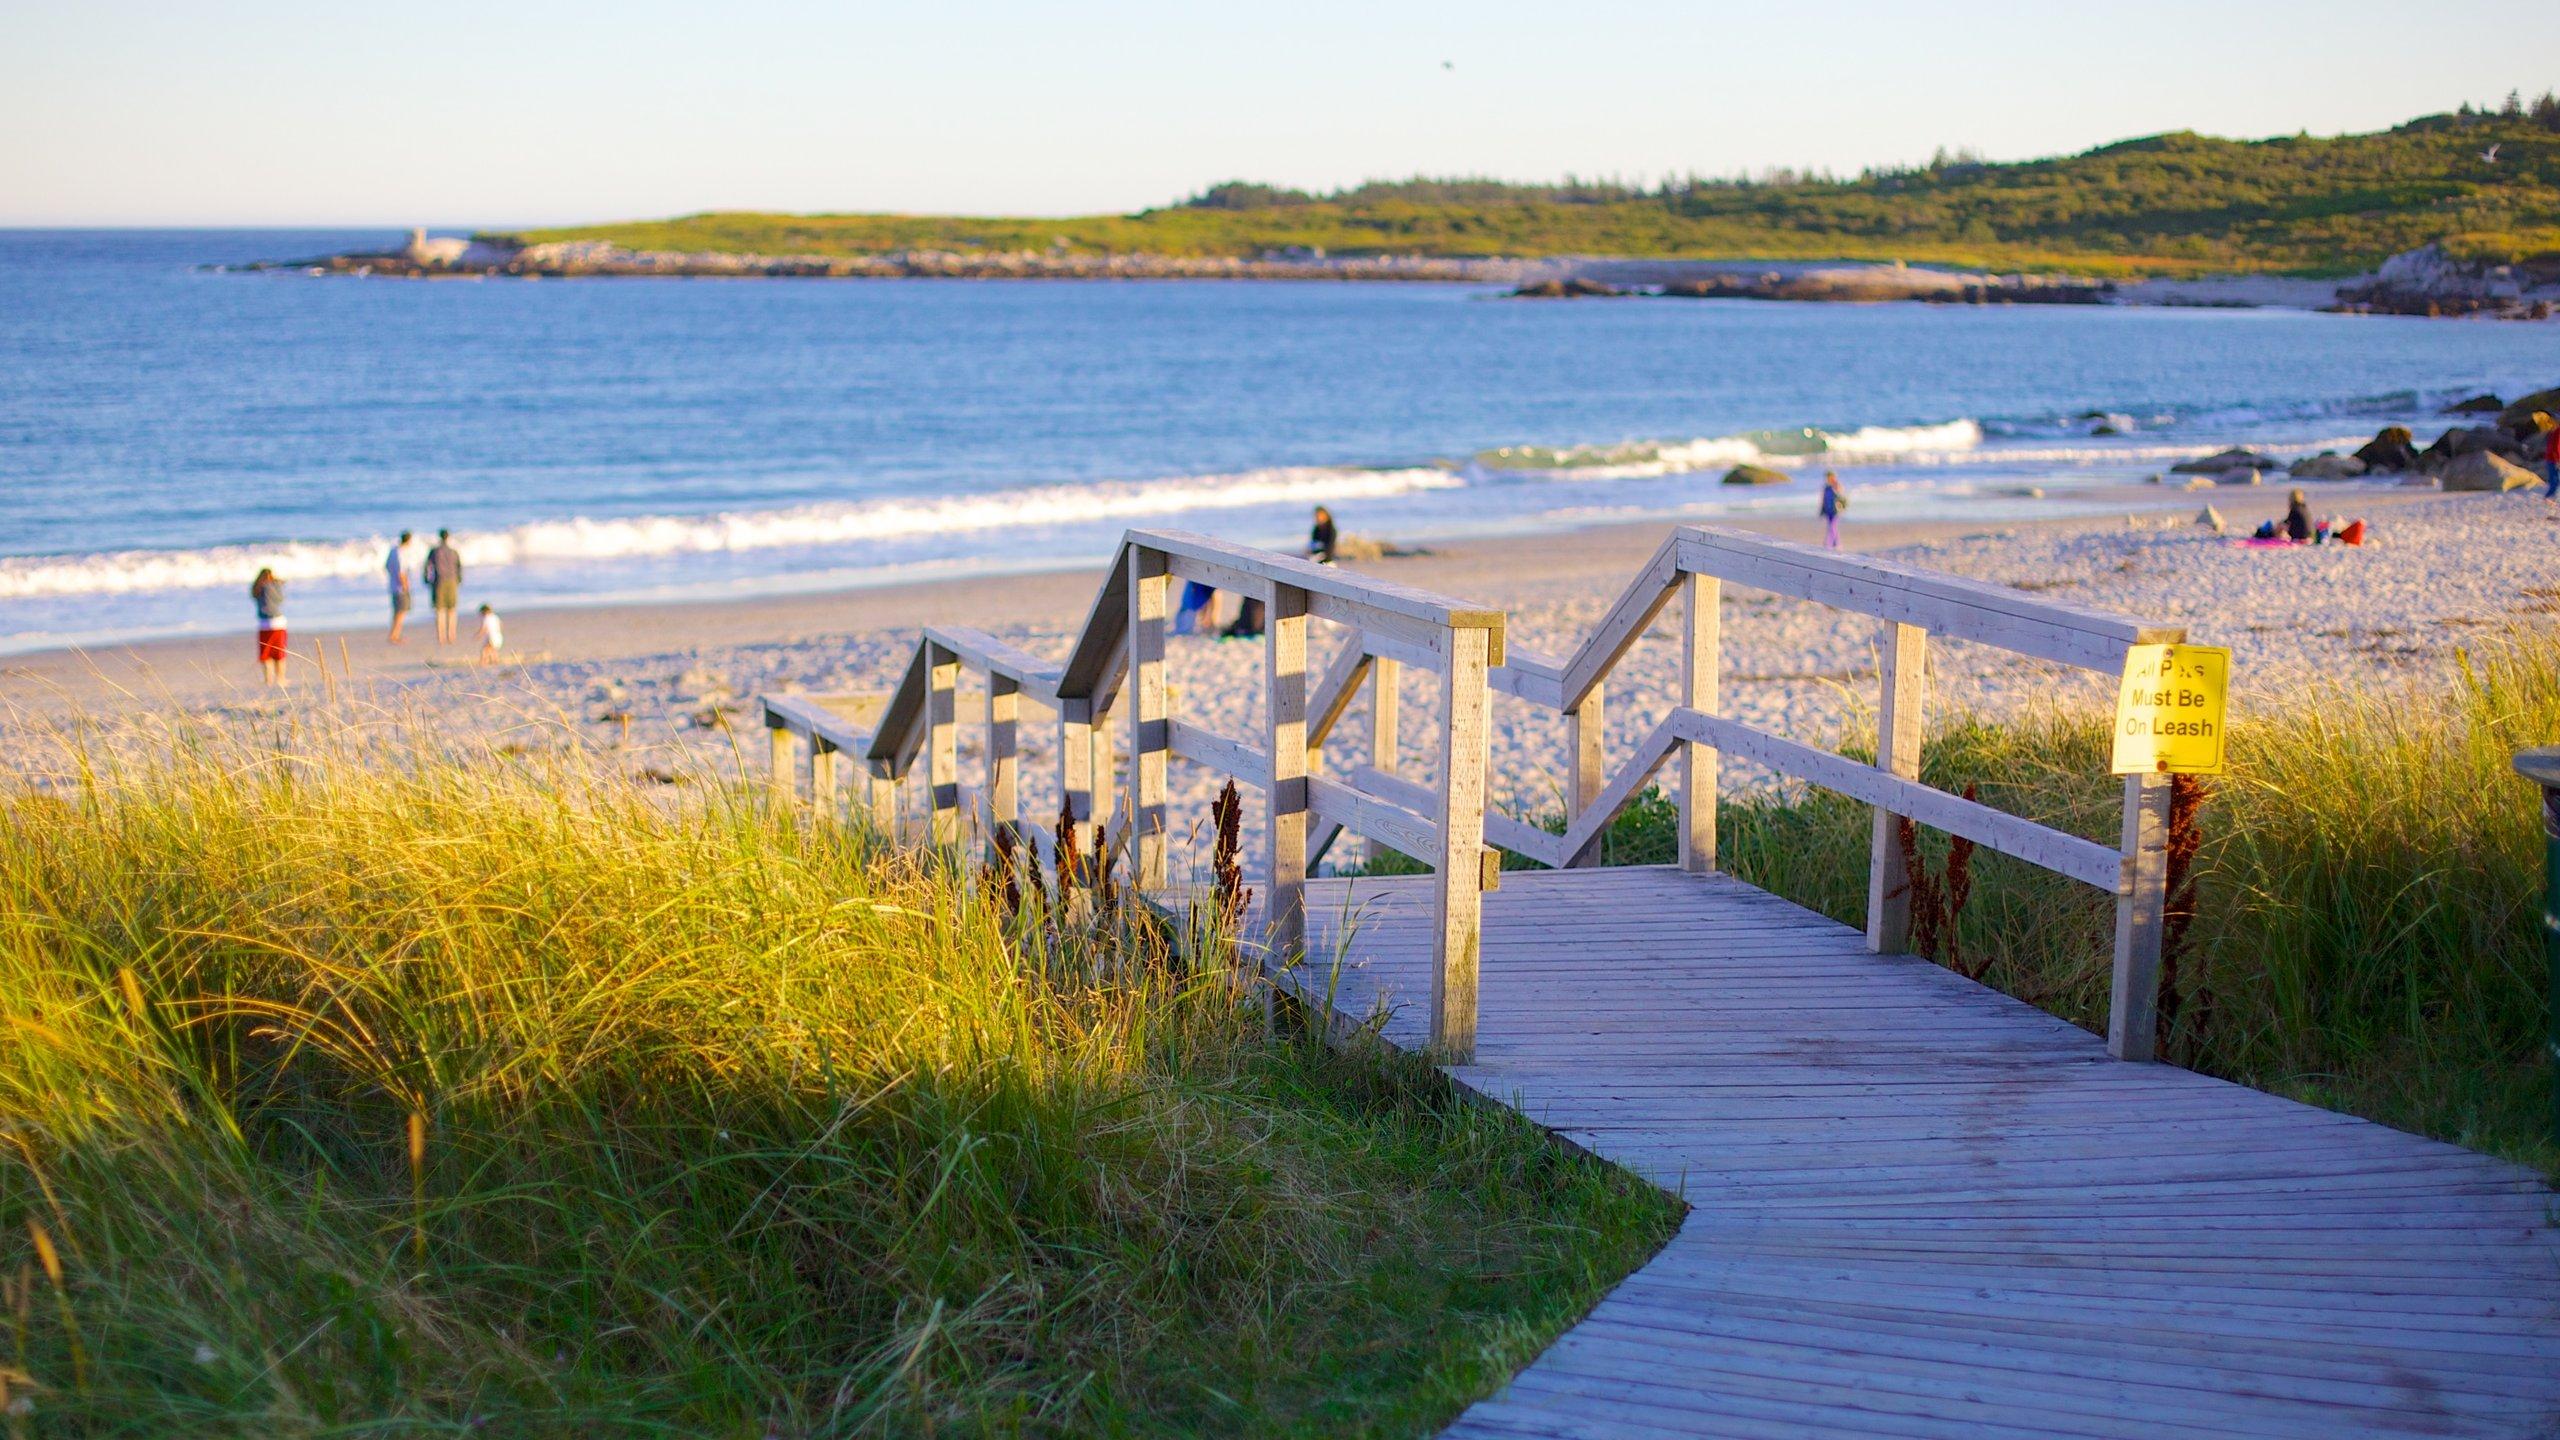 Crystal Crescent Beach - 19 Photos - Beaches - Halifax, NS